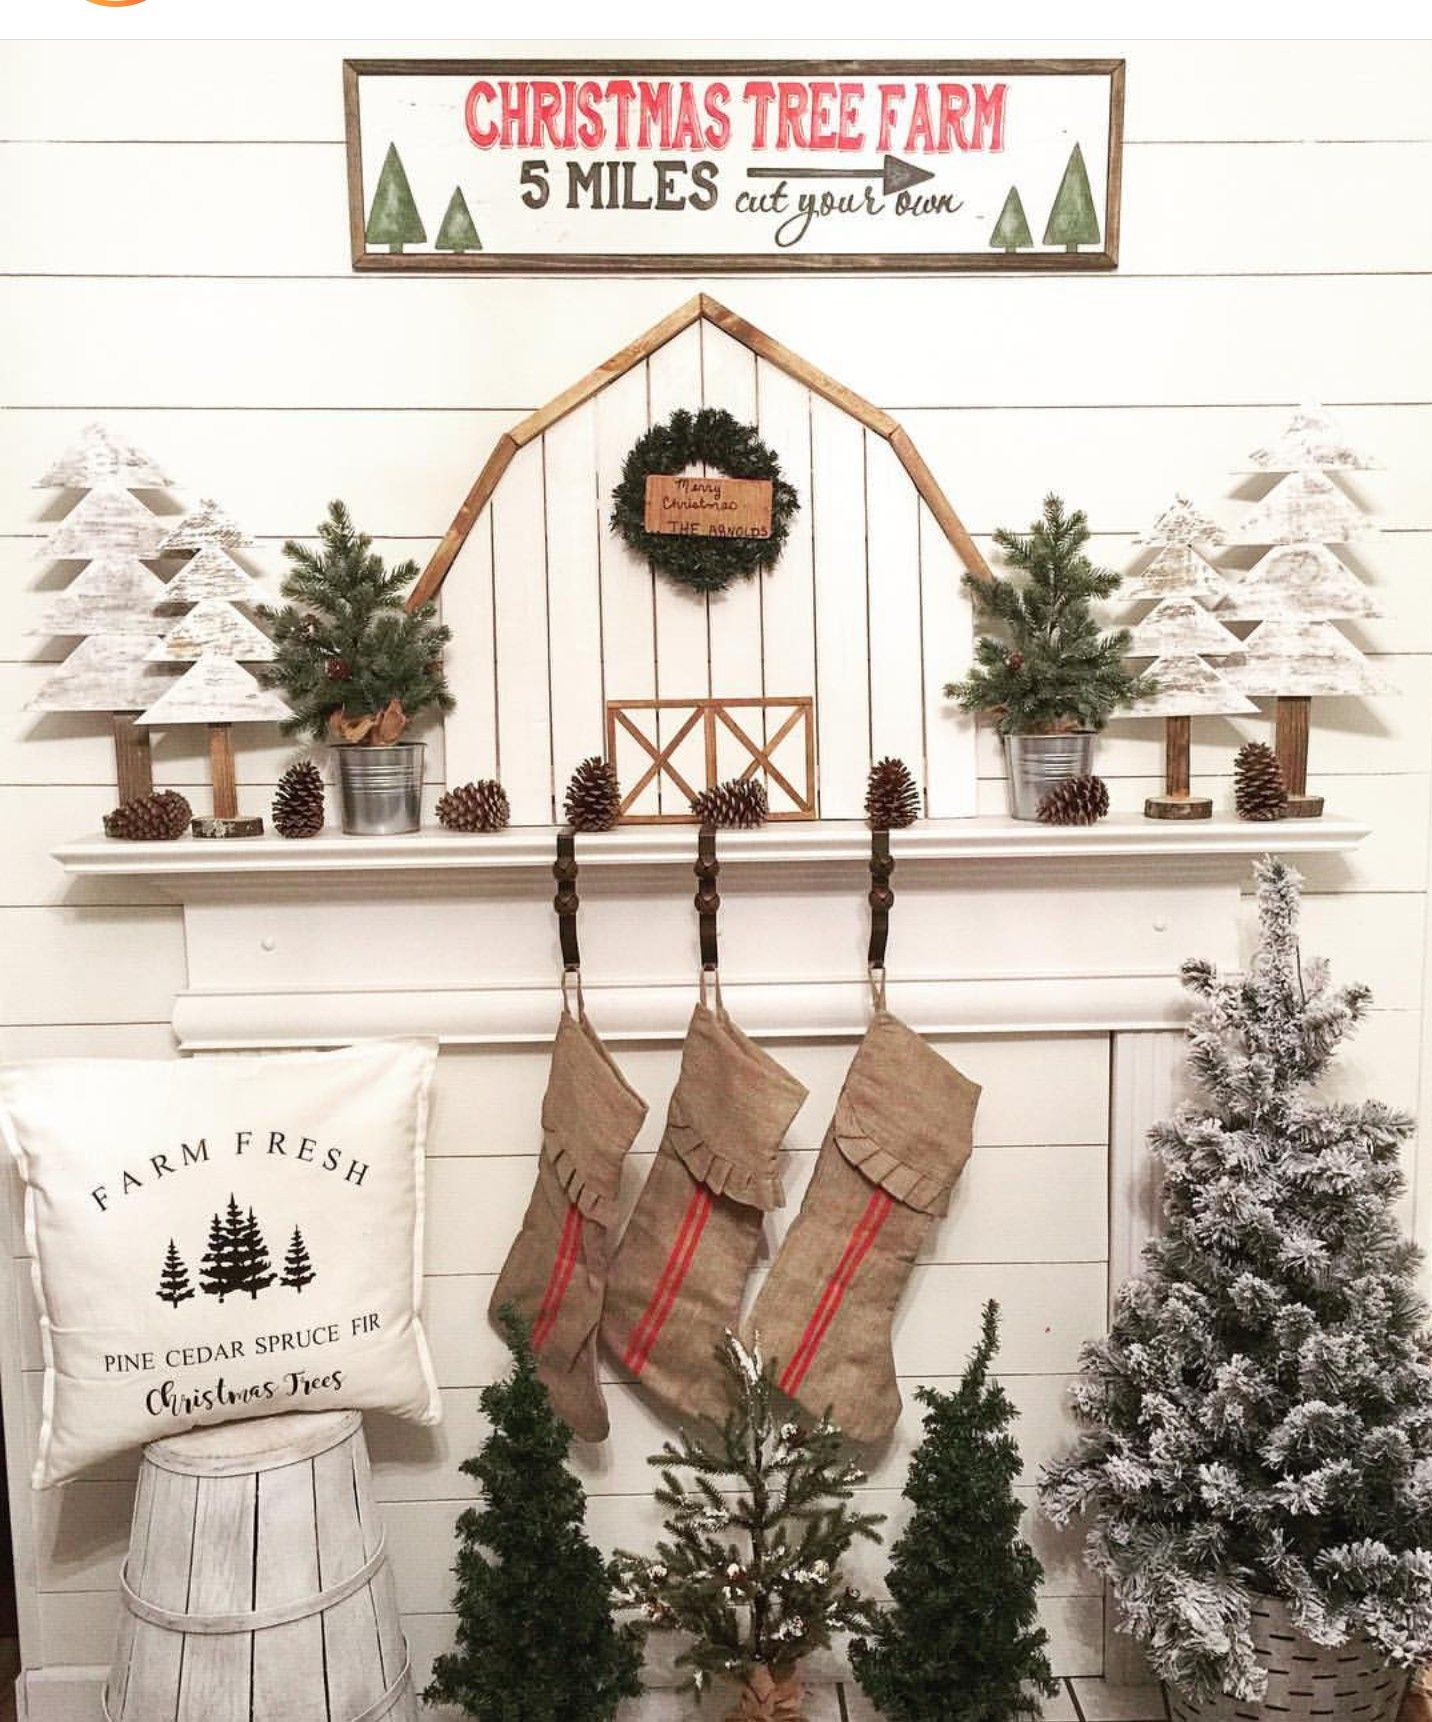 Pin By Jessica Anderson Kelber On Christmas Christmas Mantel Decorations Christmas Tree Farm Farmhouse Christmas Decor